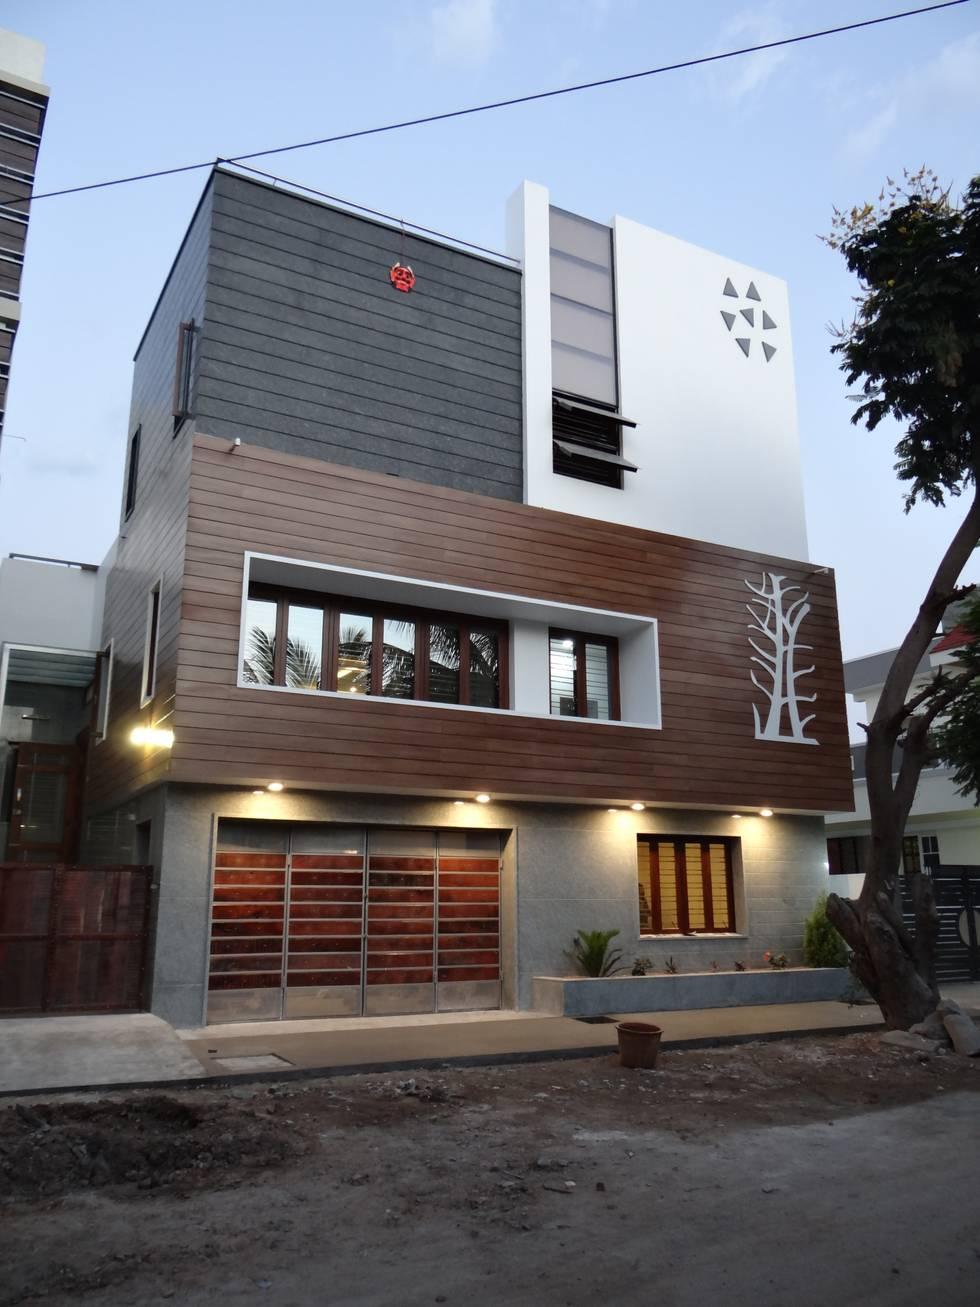 A modern but simple house from Bellary, Karnataka